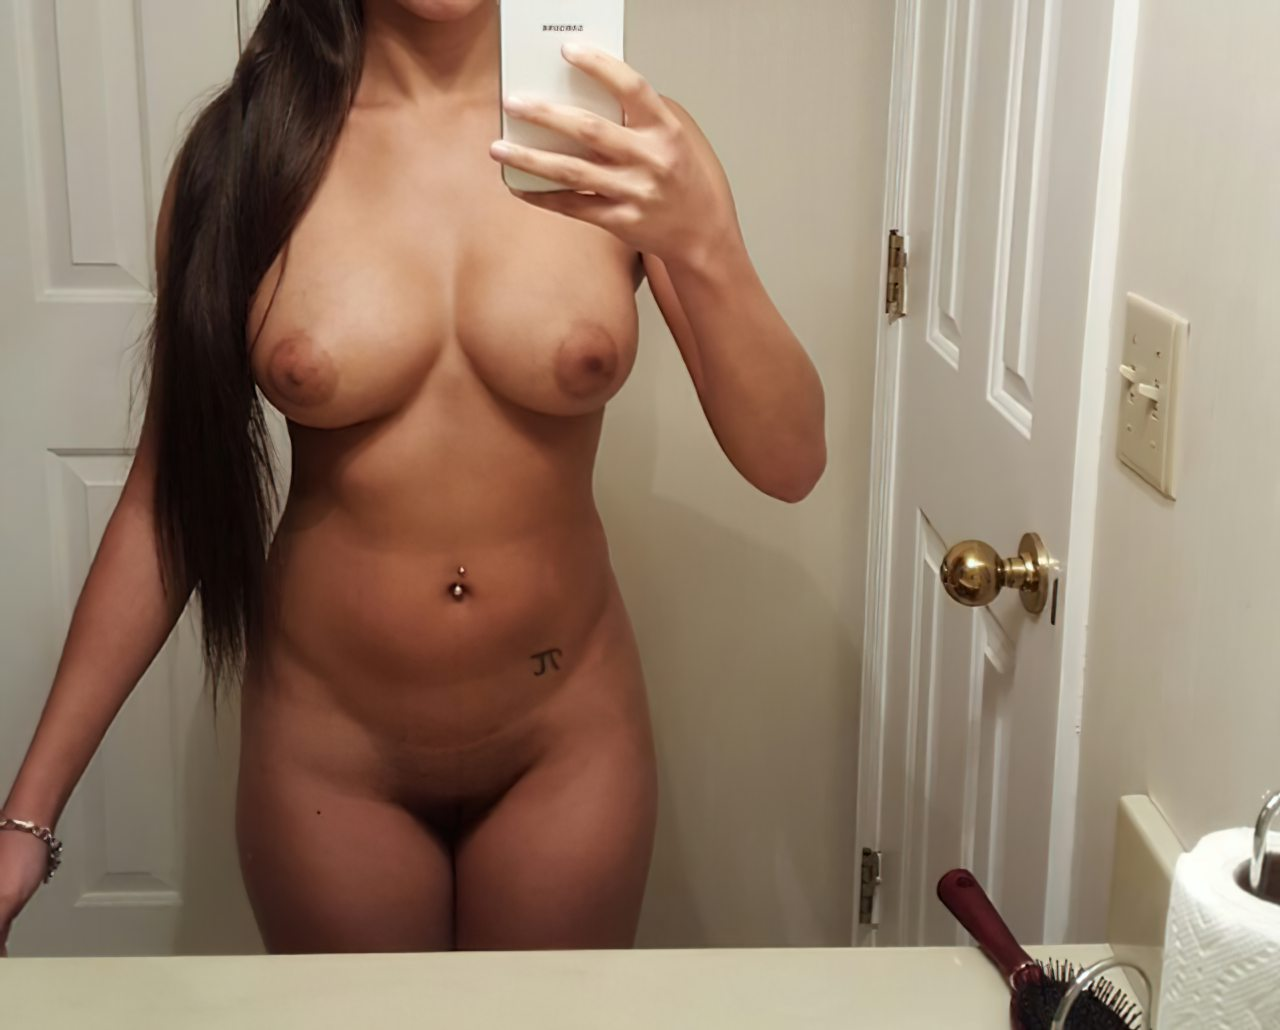 Morena Adolescente Corpo Nu (7)